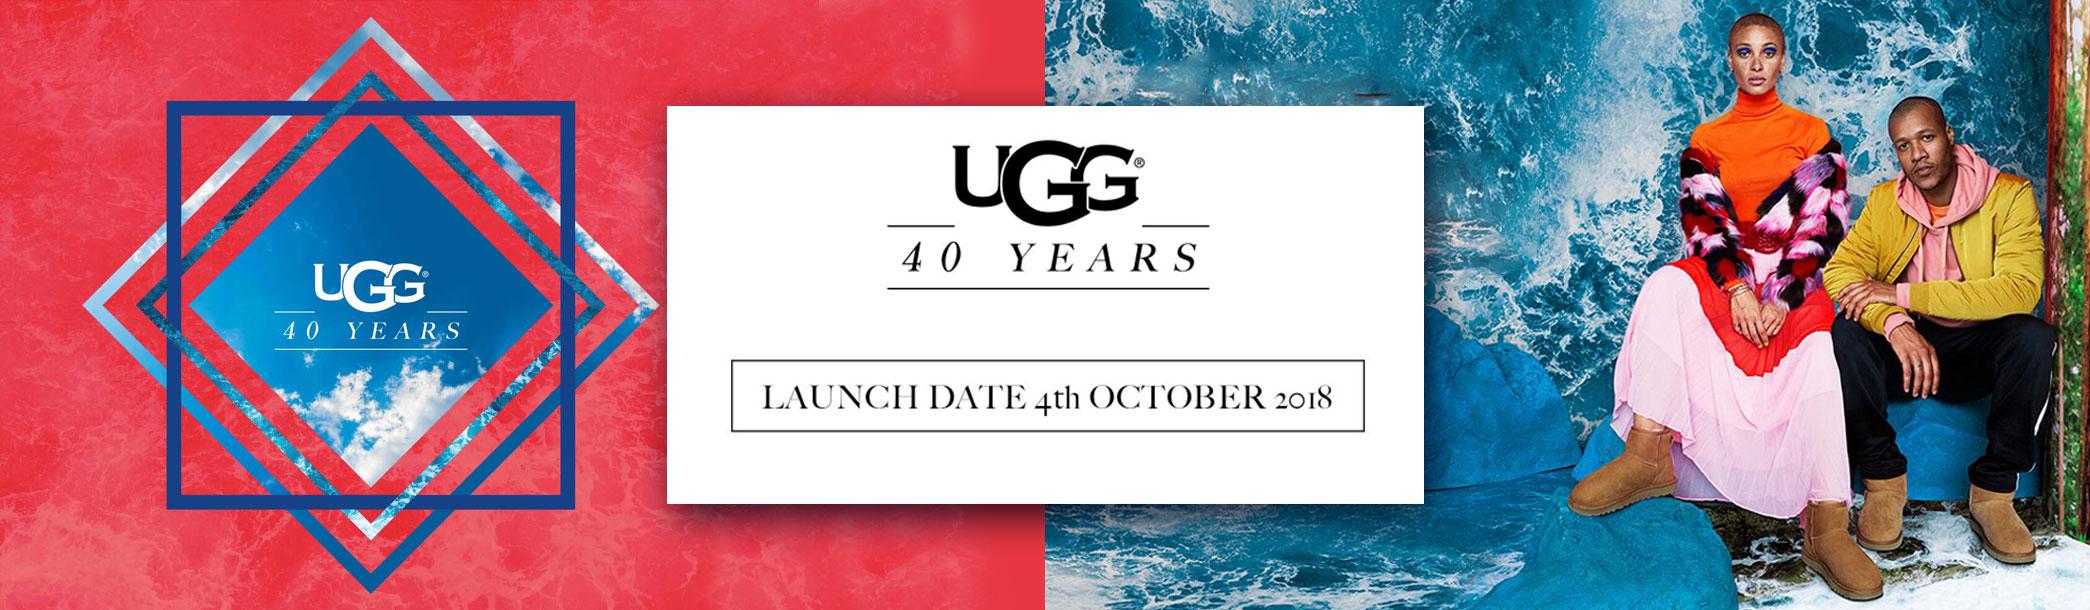 Happy 40th Birthday UGG!